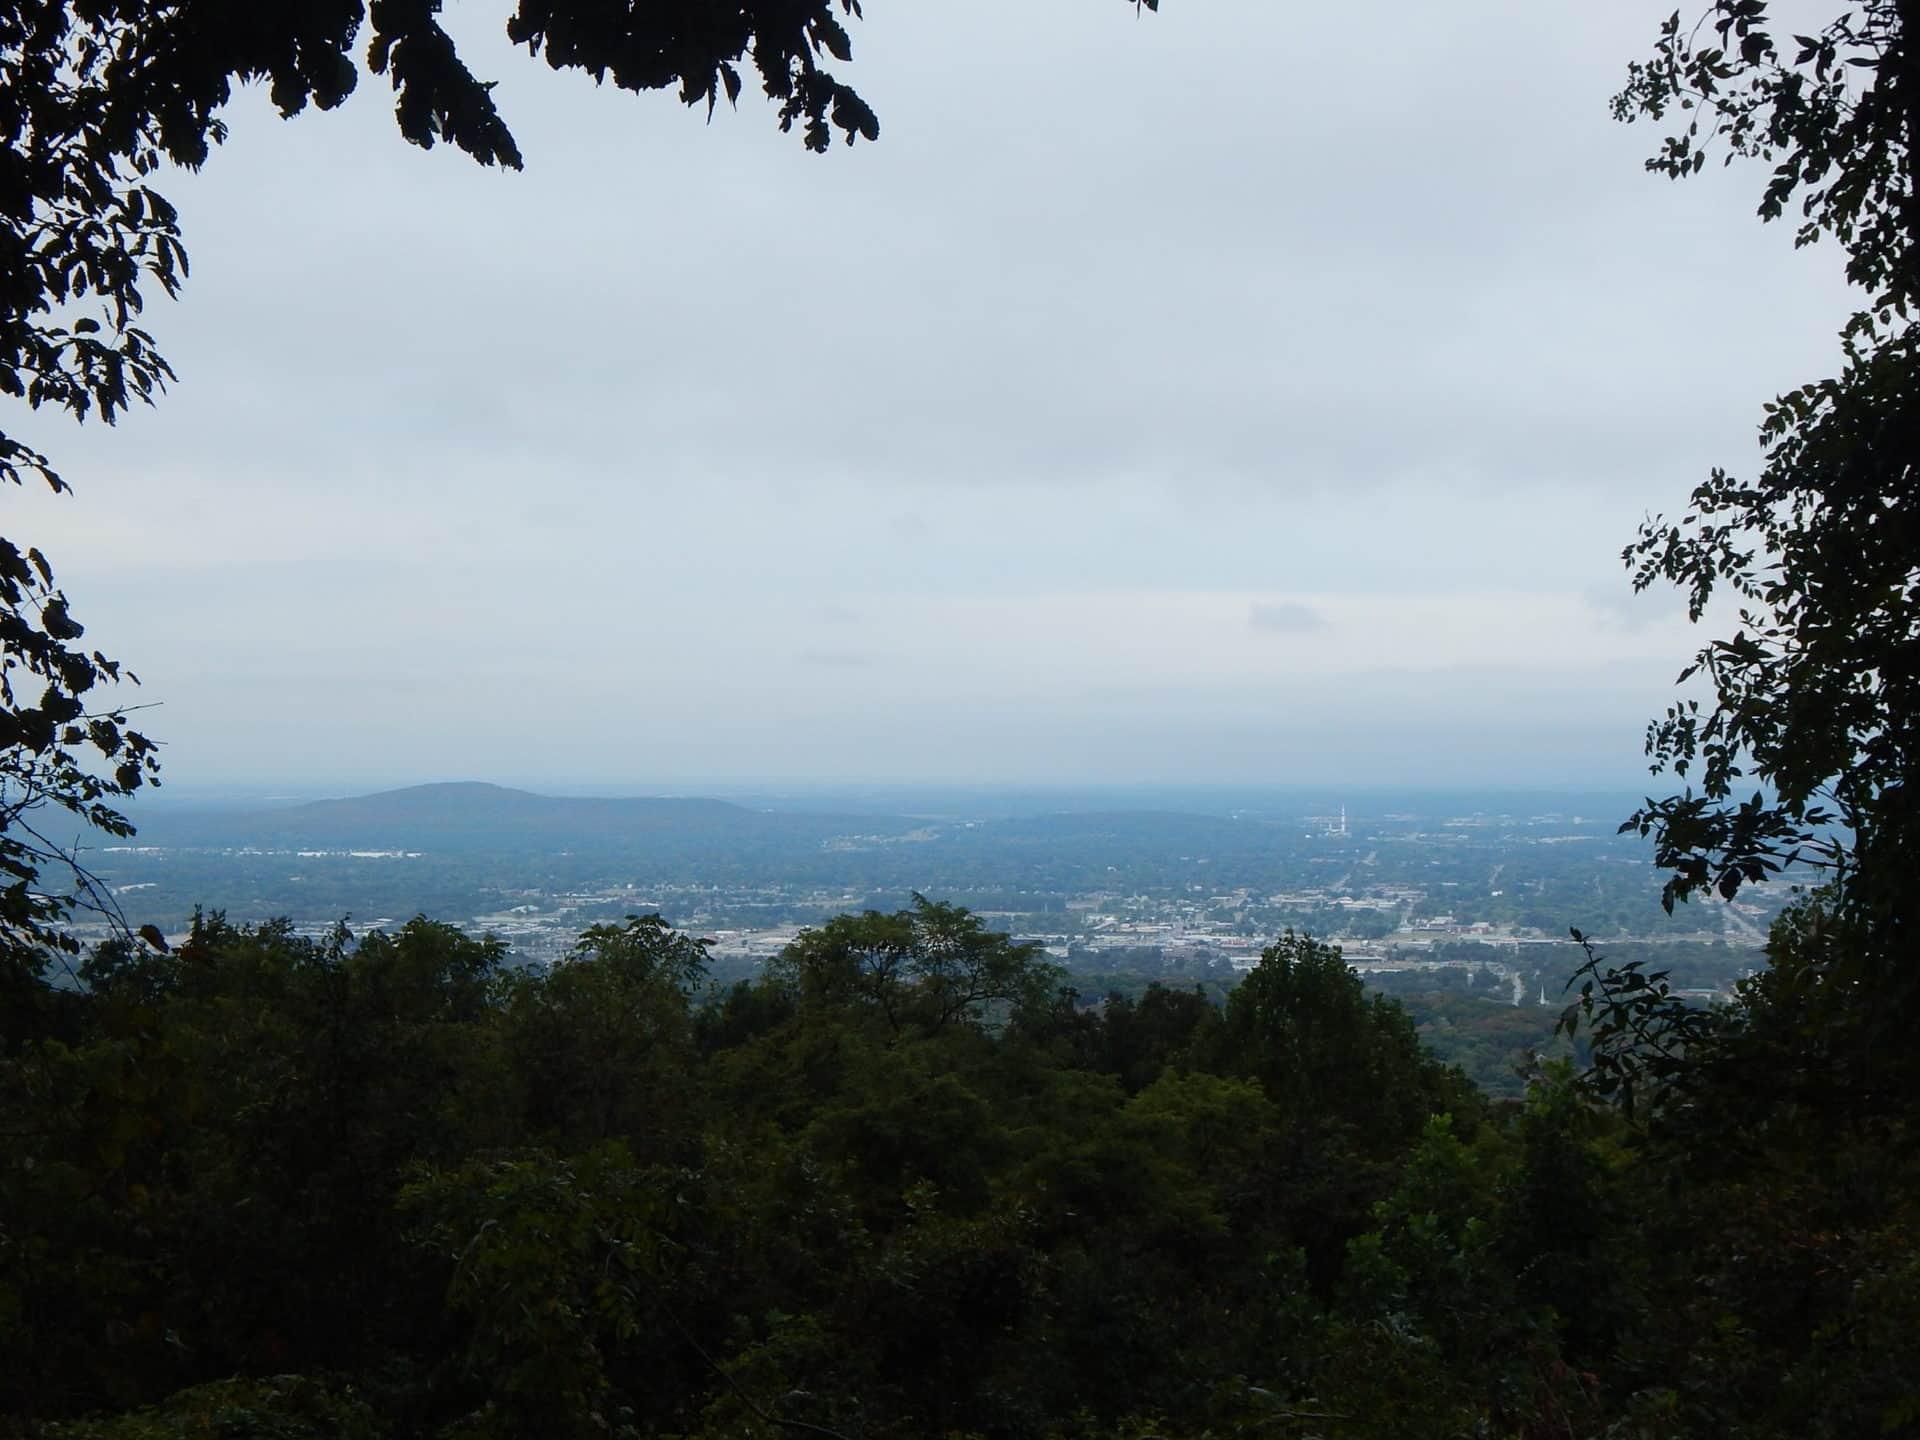 Burritt on the Mountain - View